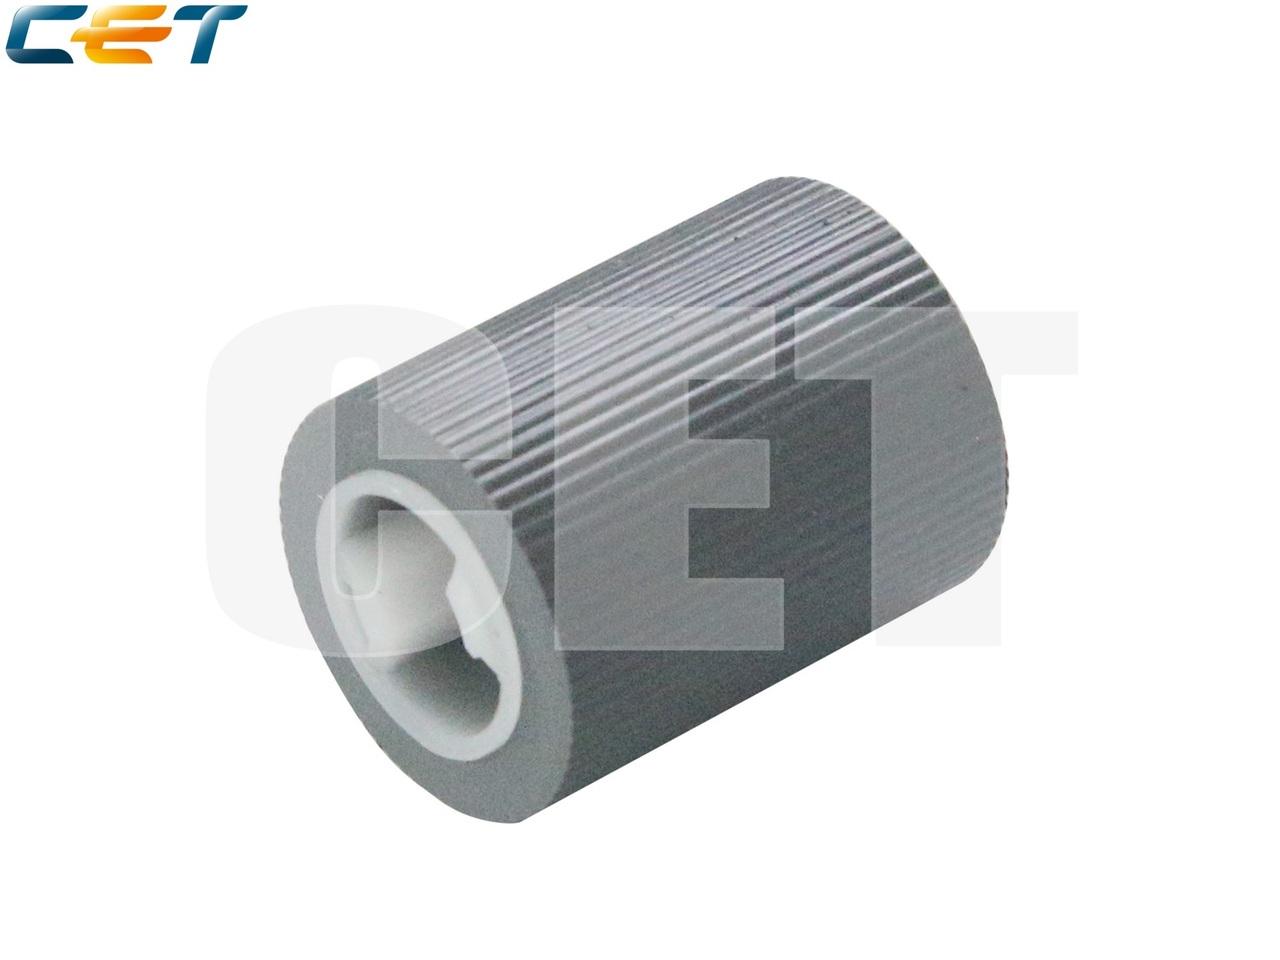 Ролик подачи FL0-4002-000 для CANON iR ADVANCEC5535/5540/5550/5560 (CET), CET5295